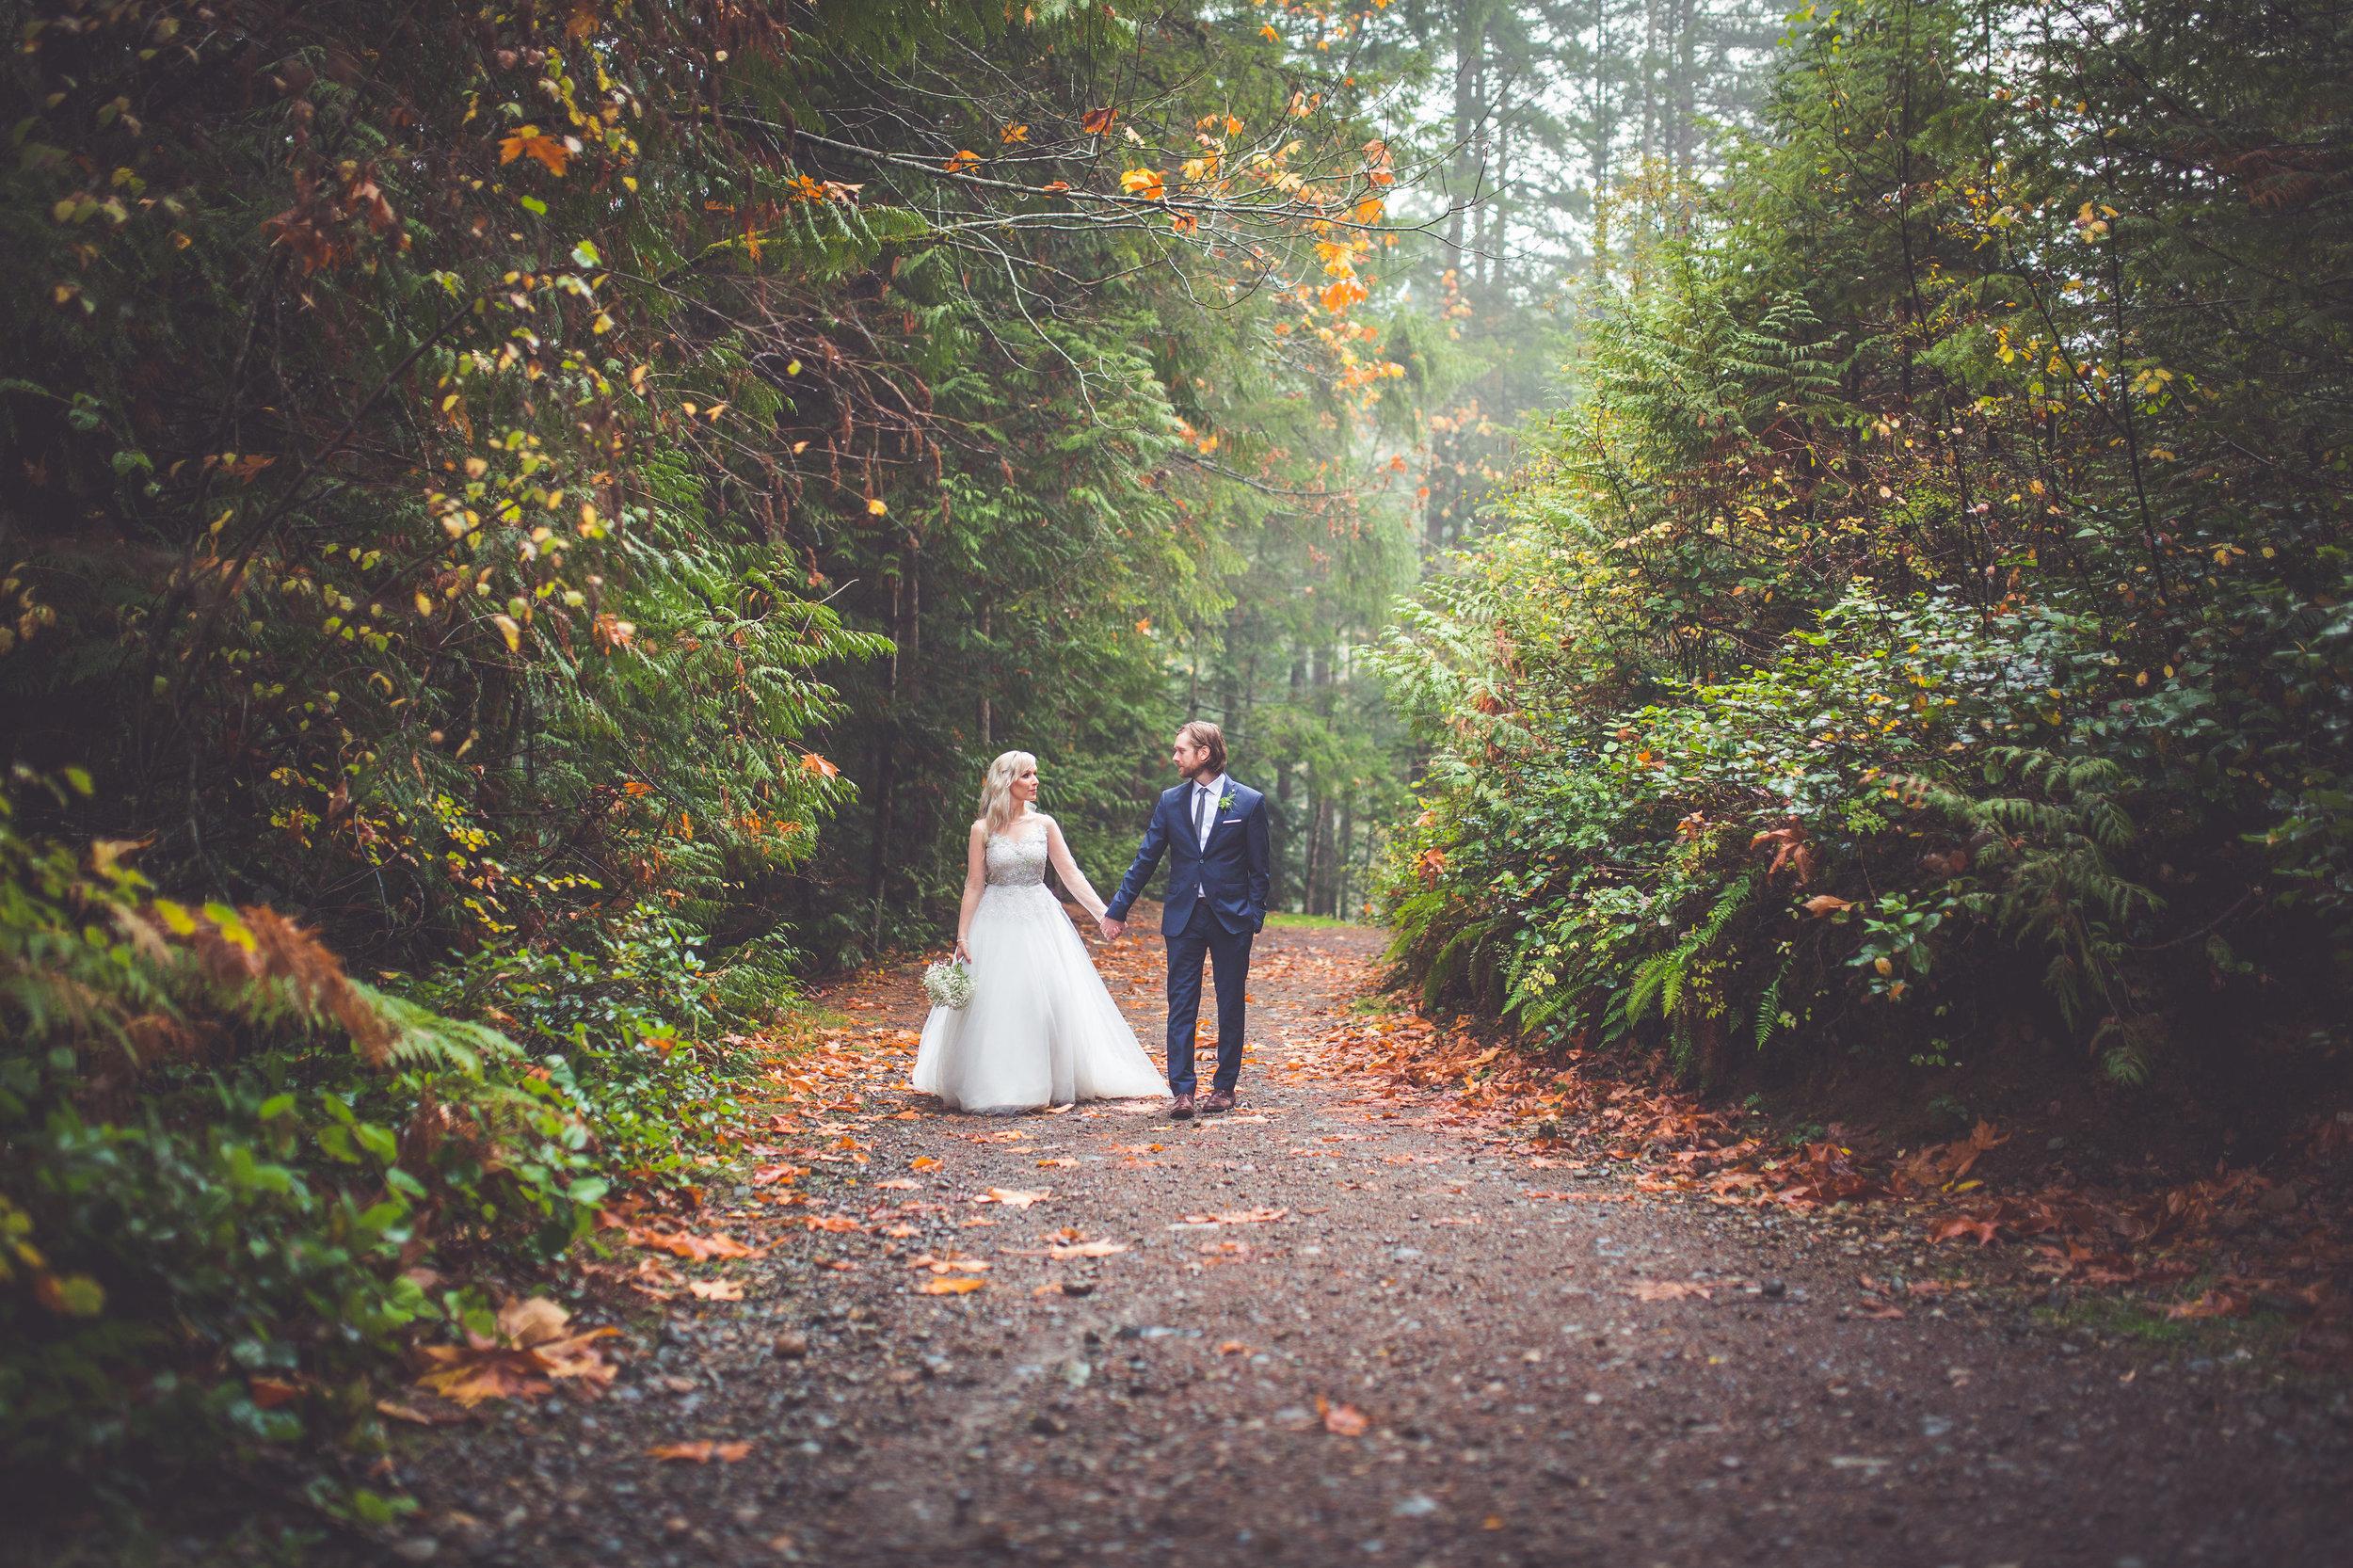 whimsical-romantic-wedding-top-bridge-54.jpg